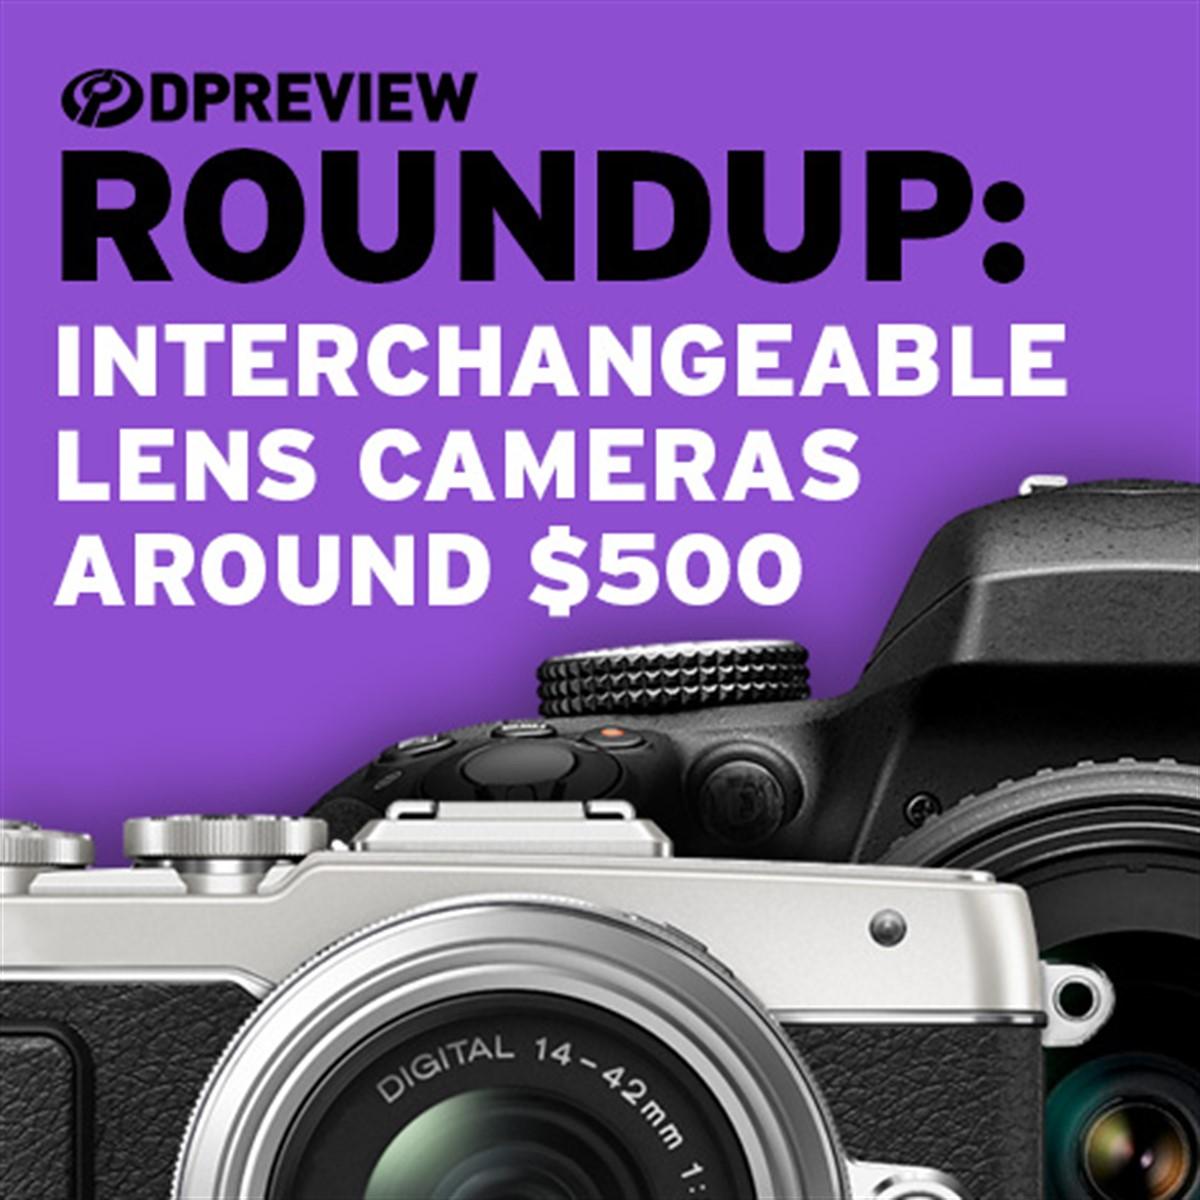 2017 Roundup: Interchangeable Lens Cameras around $500: Digital